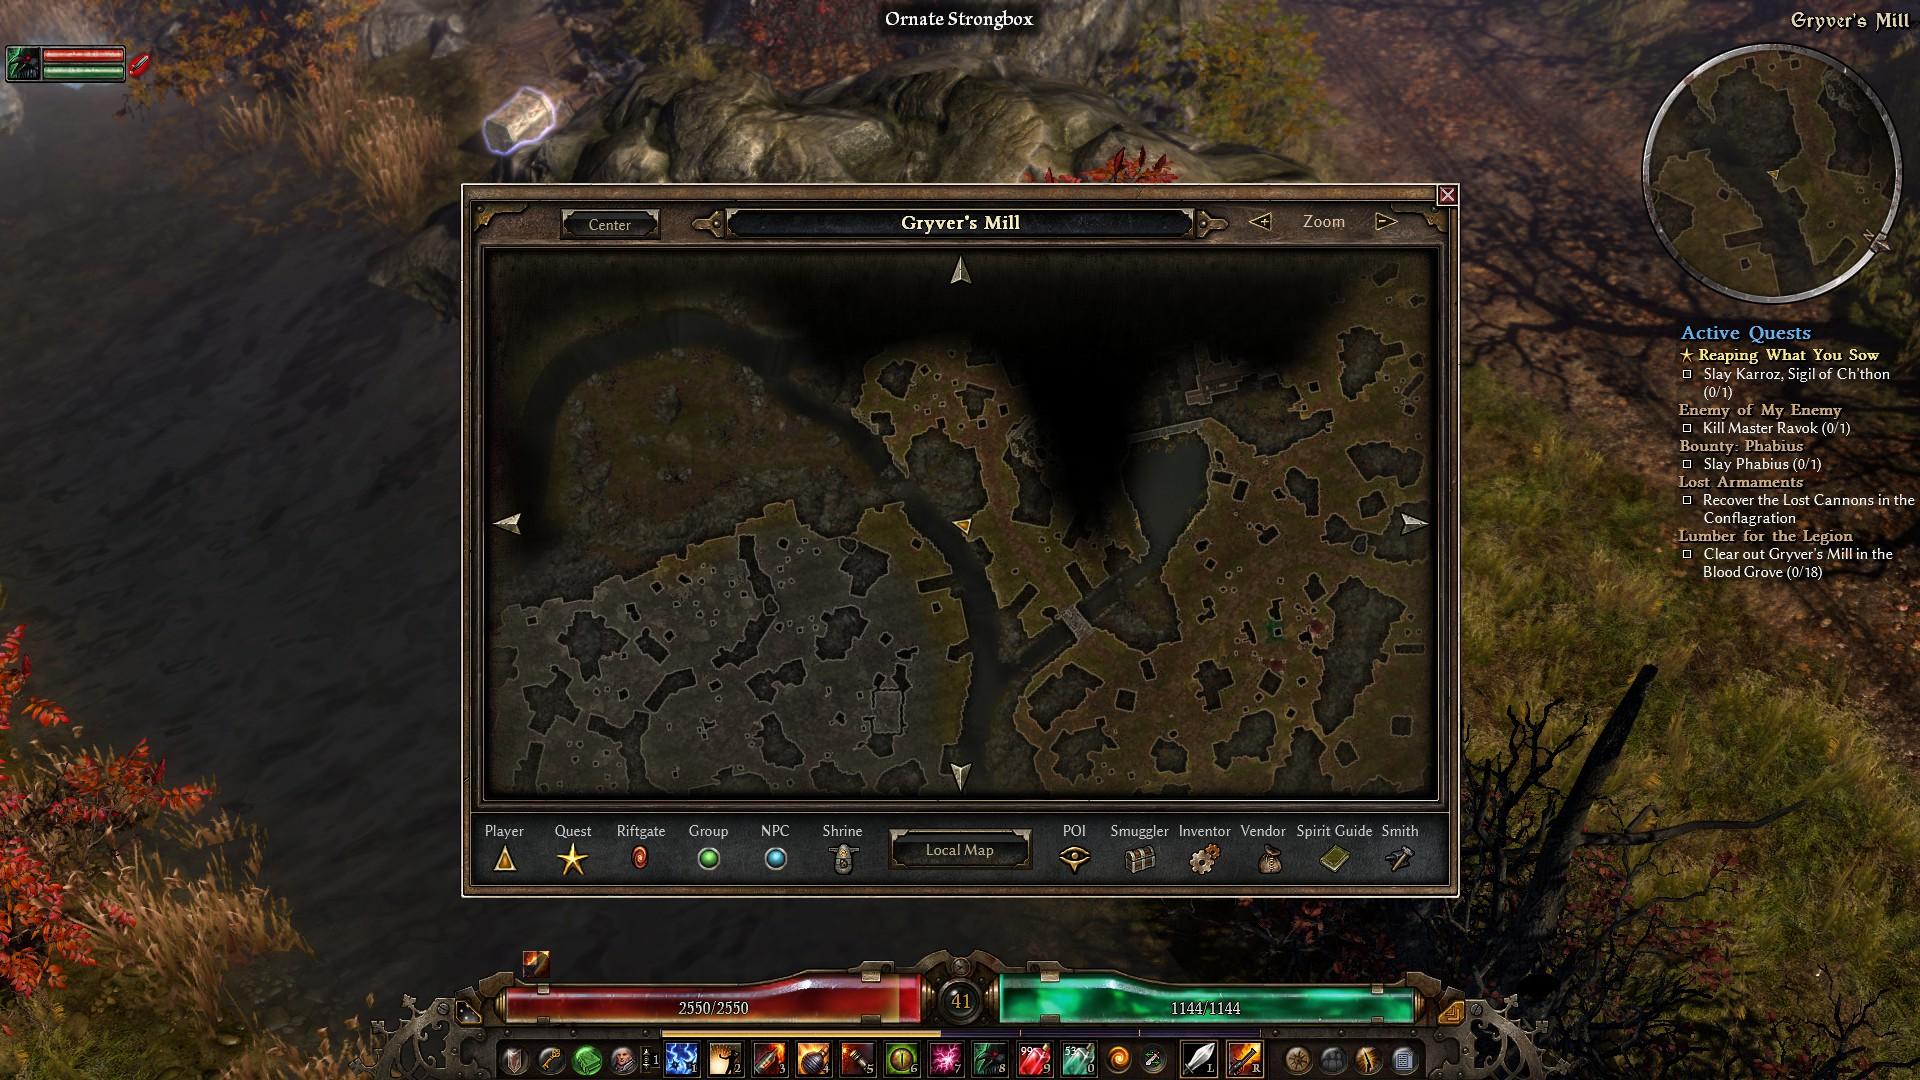 Steam Community :: Screenshot :: Grim Dawn Chest 3